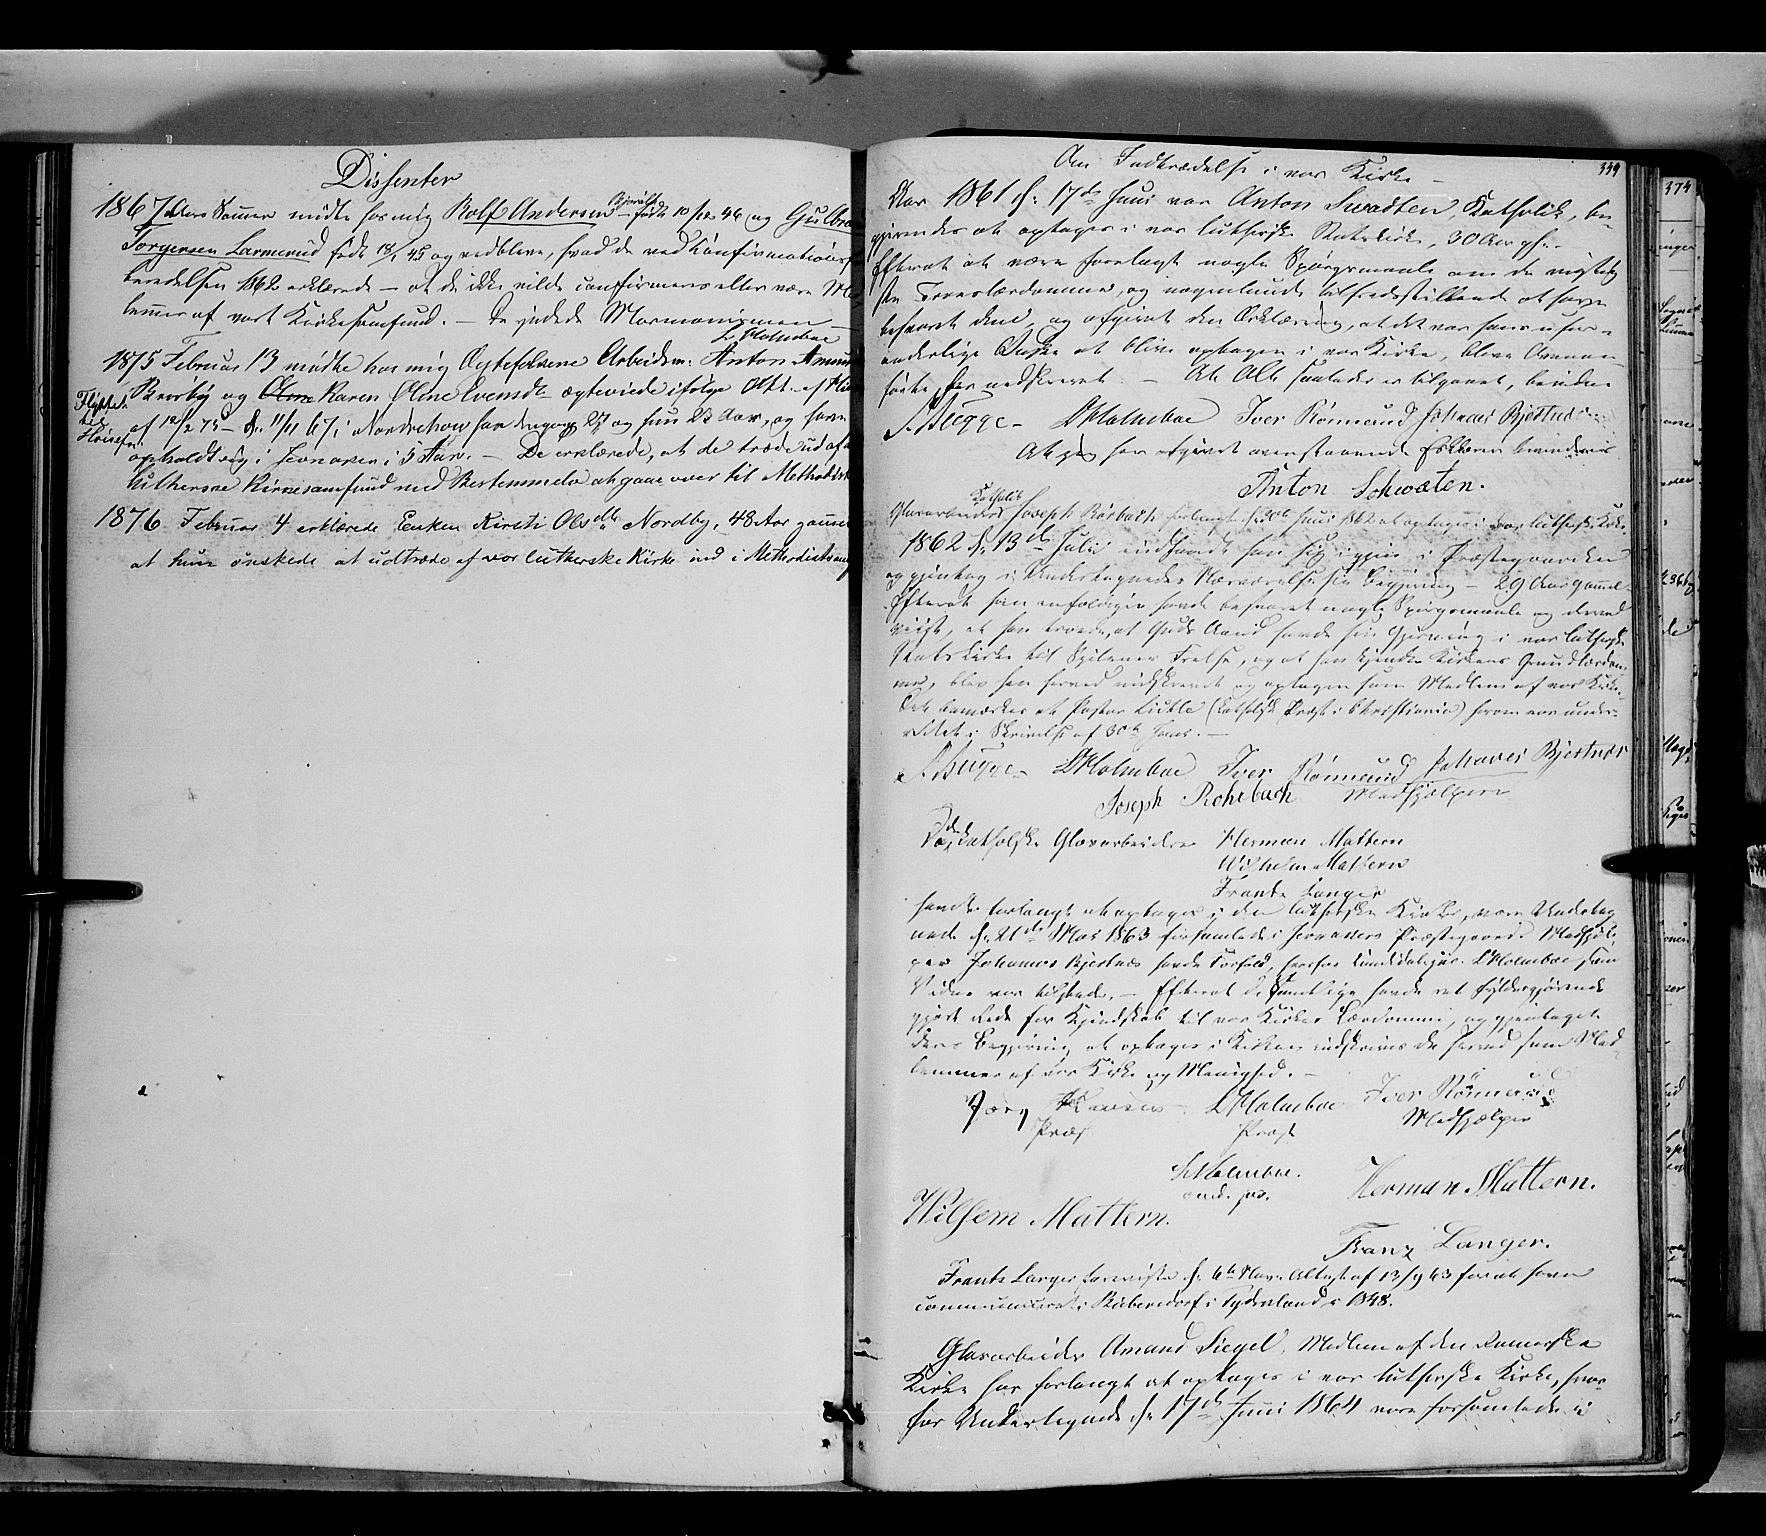 SAH, Jevnaker prestekontor, Ministerialbok nr. 7, 1858-1876, s. 349